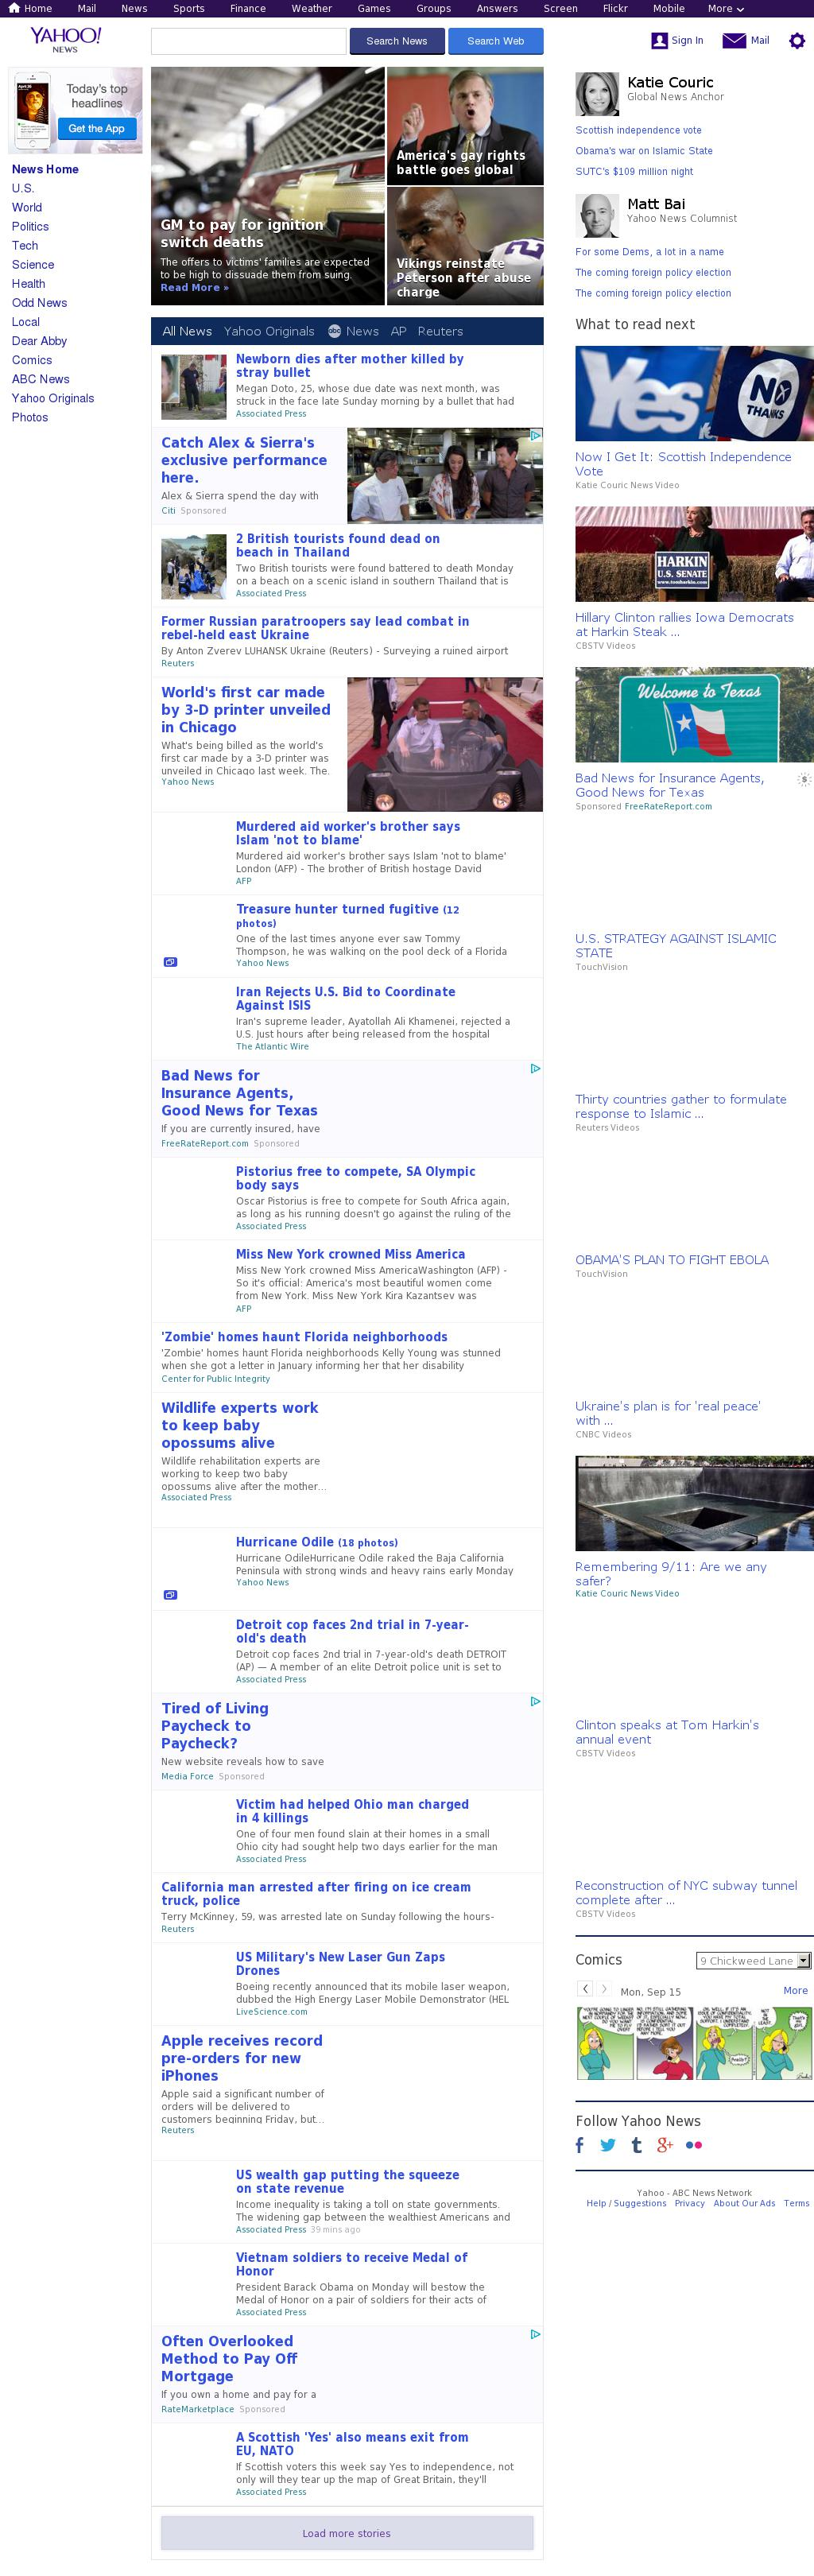 Yahoo! News at Monday Sept. 15, 2014, 4:19 p.m. UTC